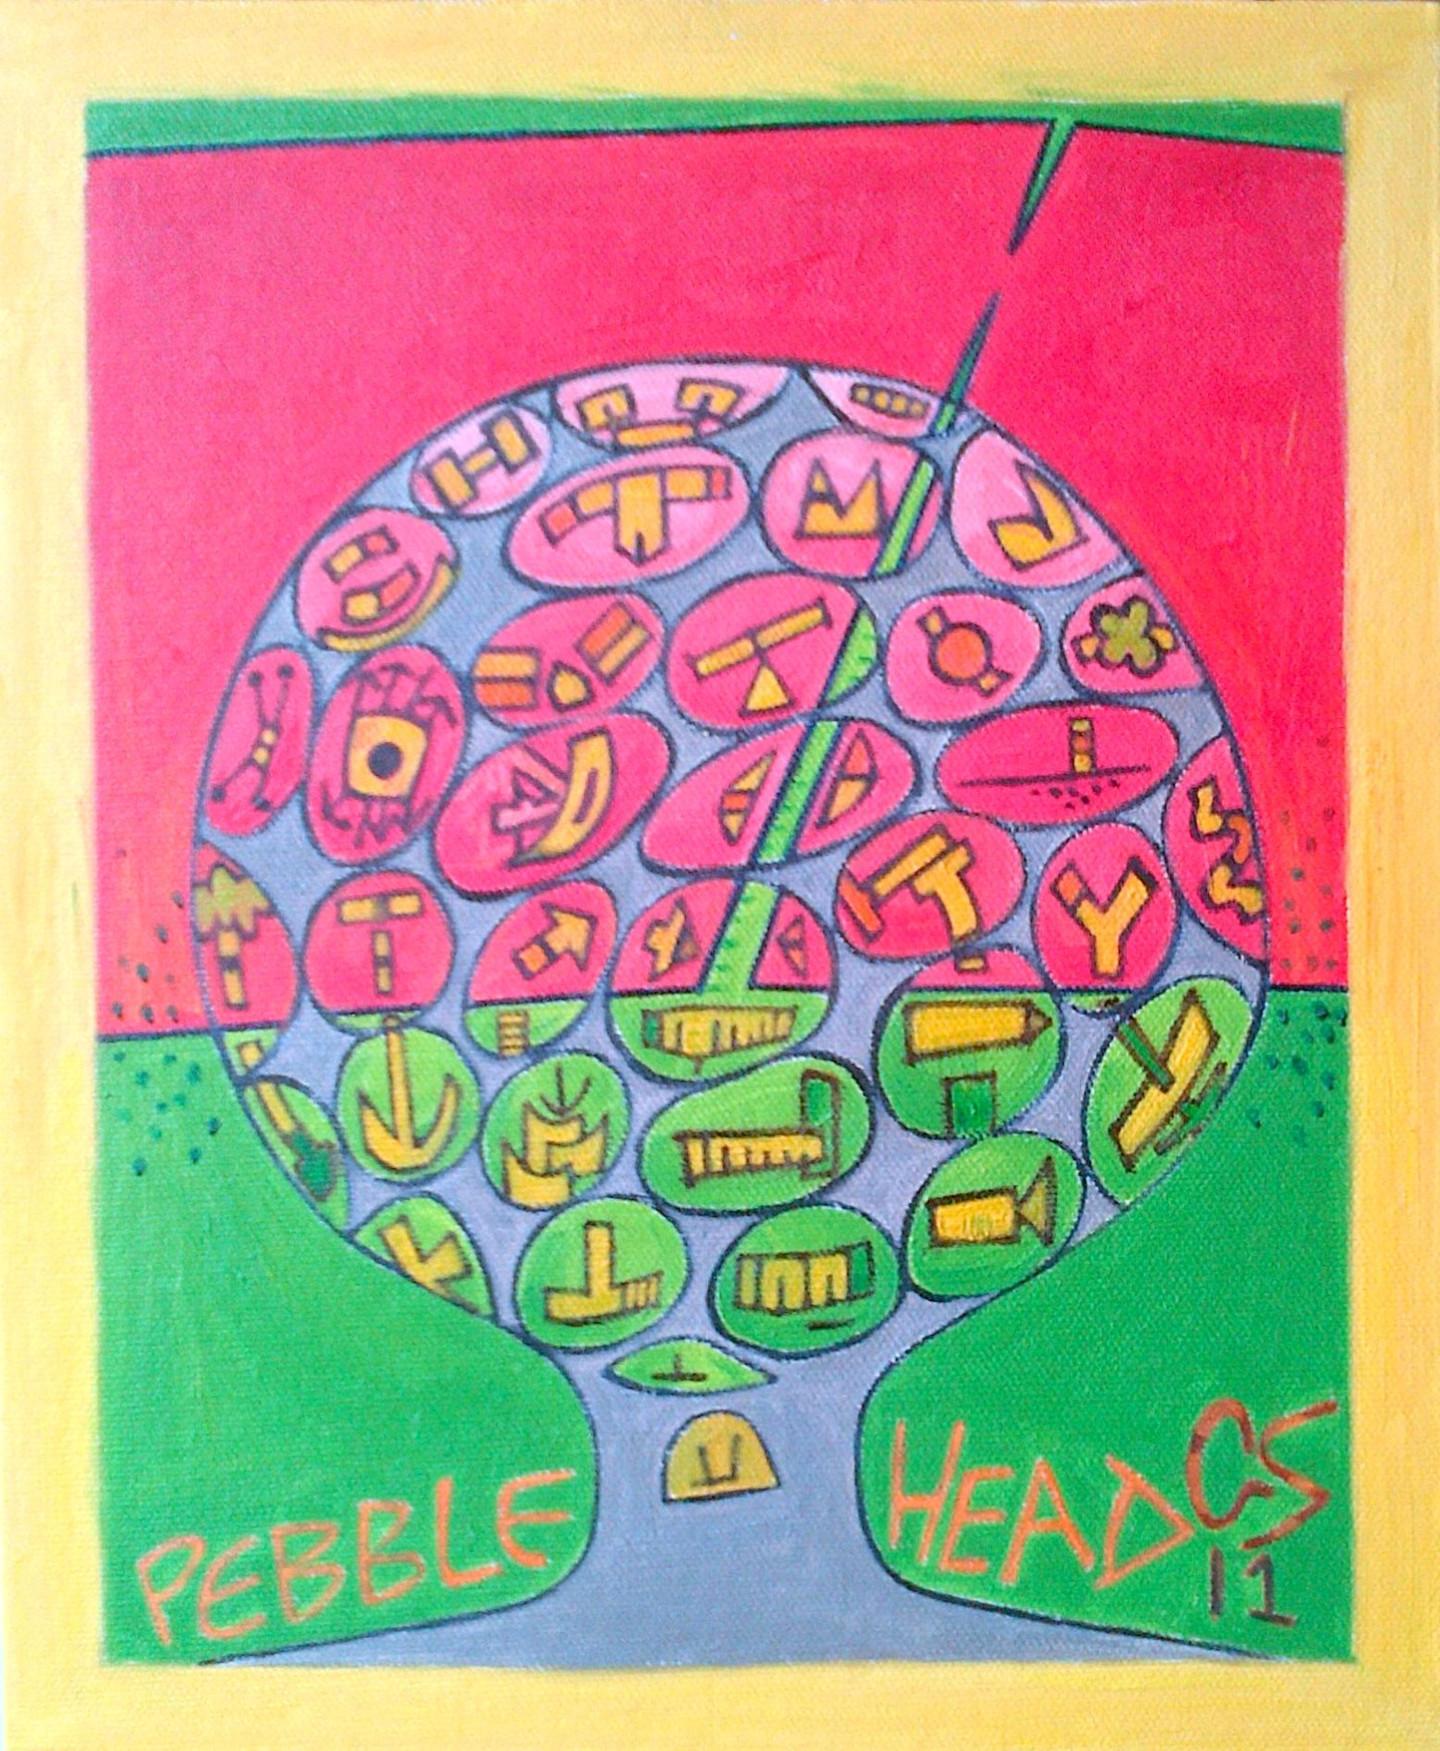 Gerald Shepherd - Pebble Head